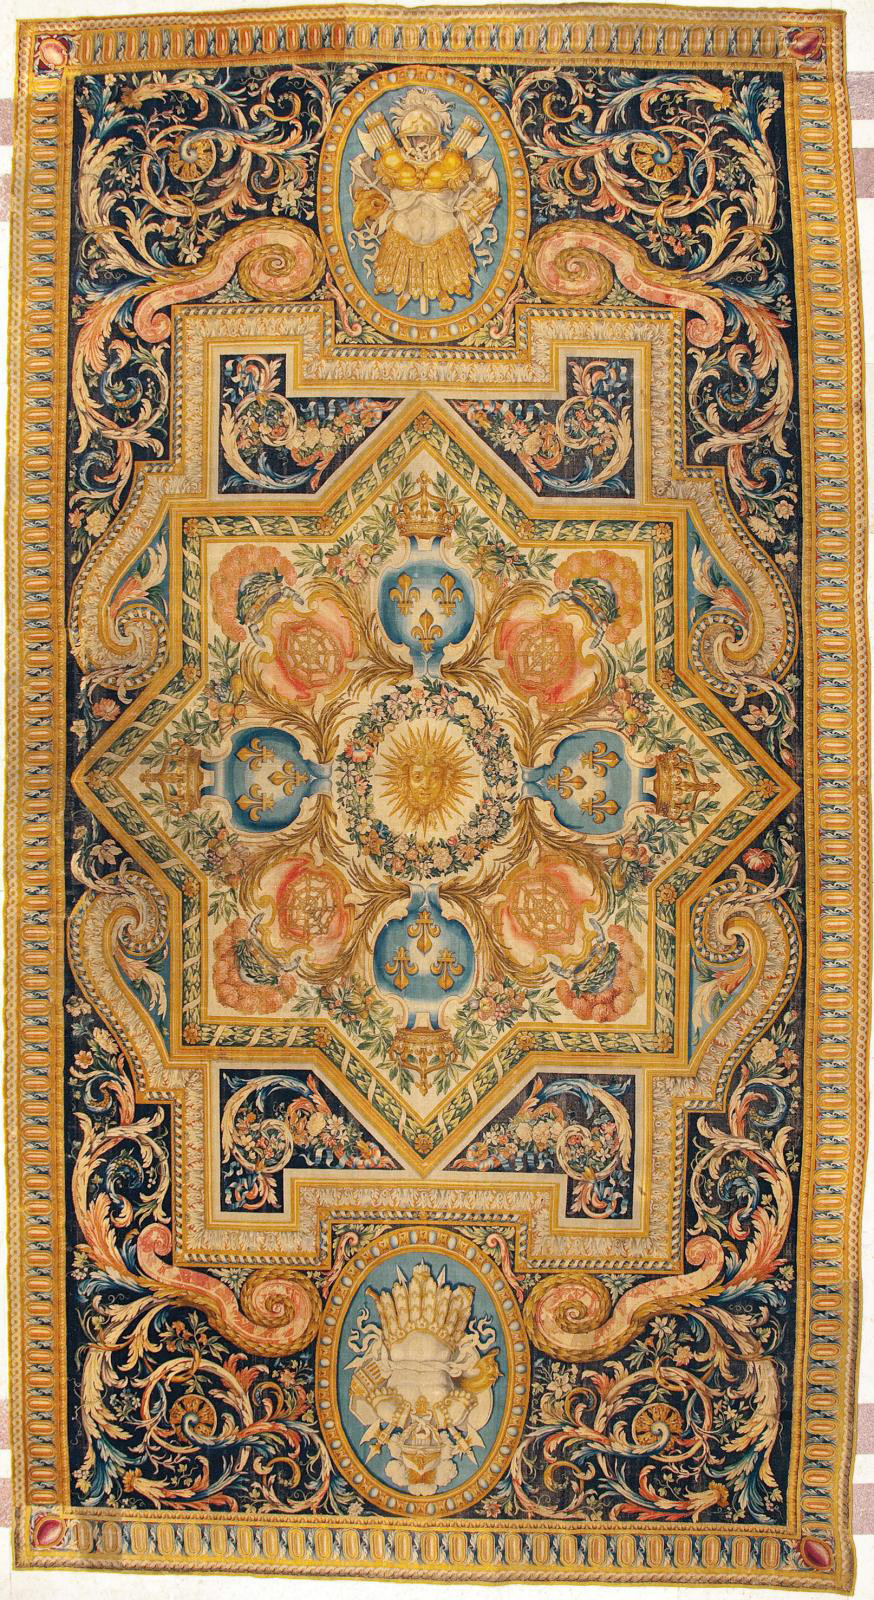 Large Savonnerie carpet made for the Galerie du Bord de l'Eau, 1668-1669, based on a design by Charles Lebrun.© Phlippe Jolivel/ Banque de